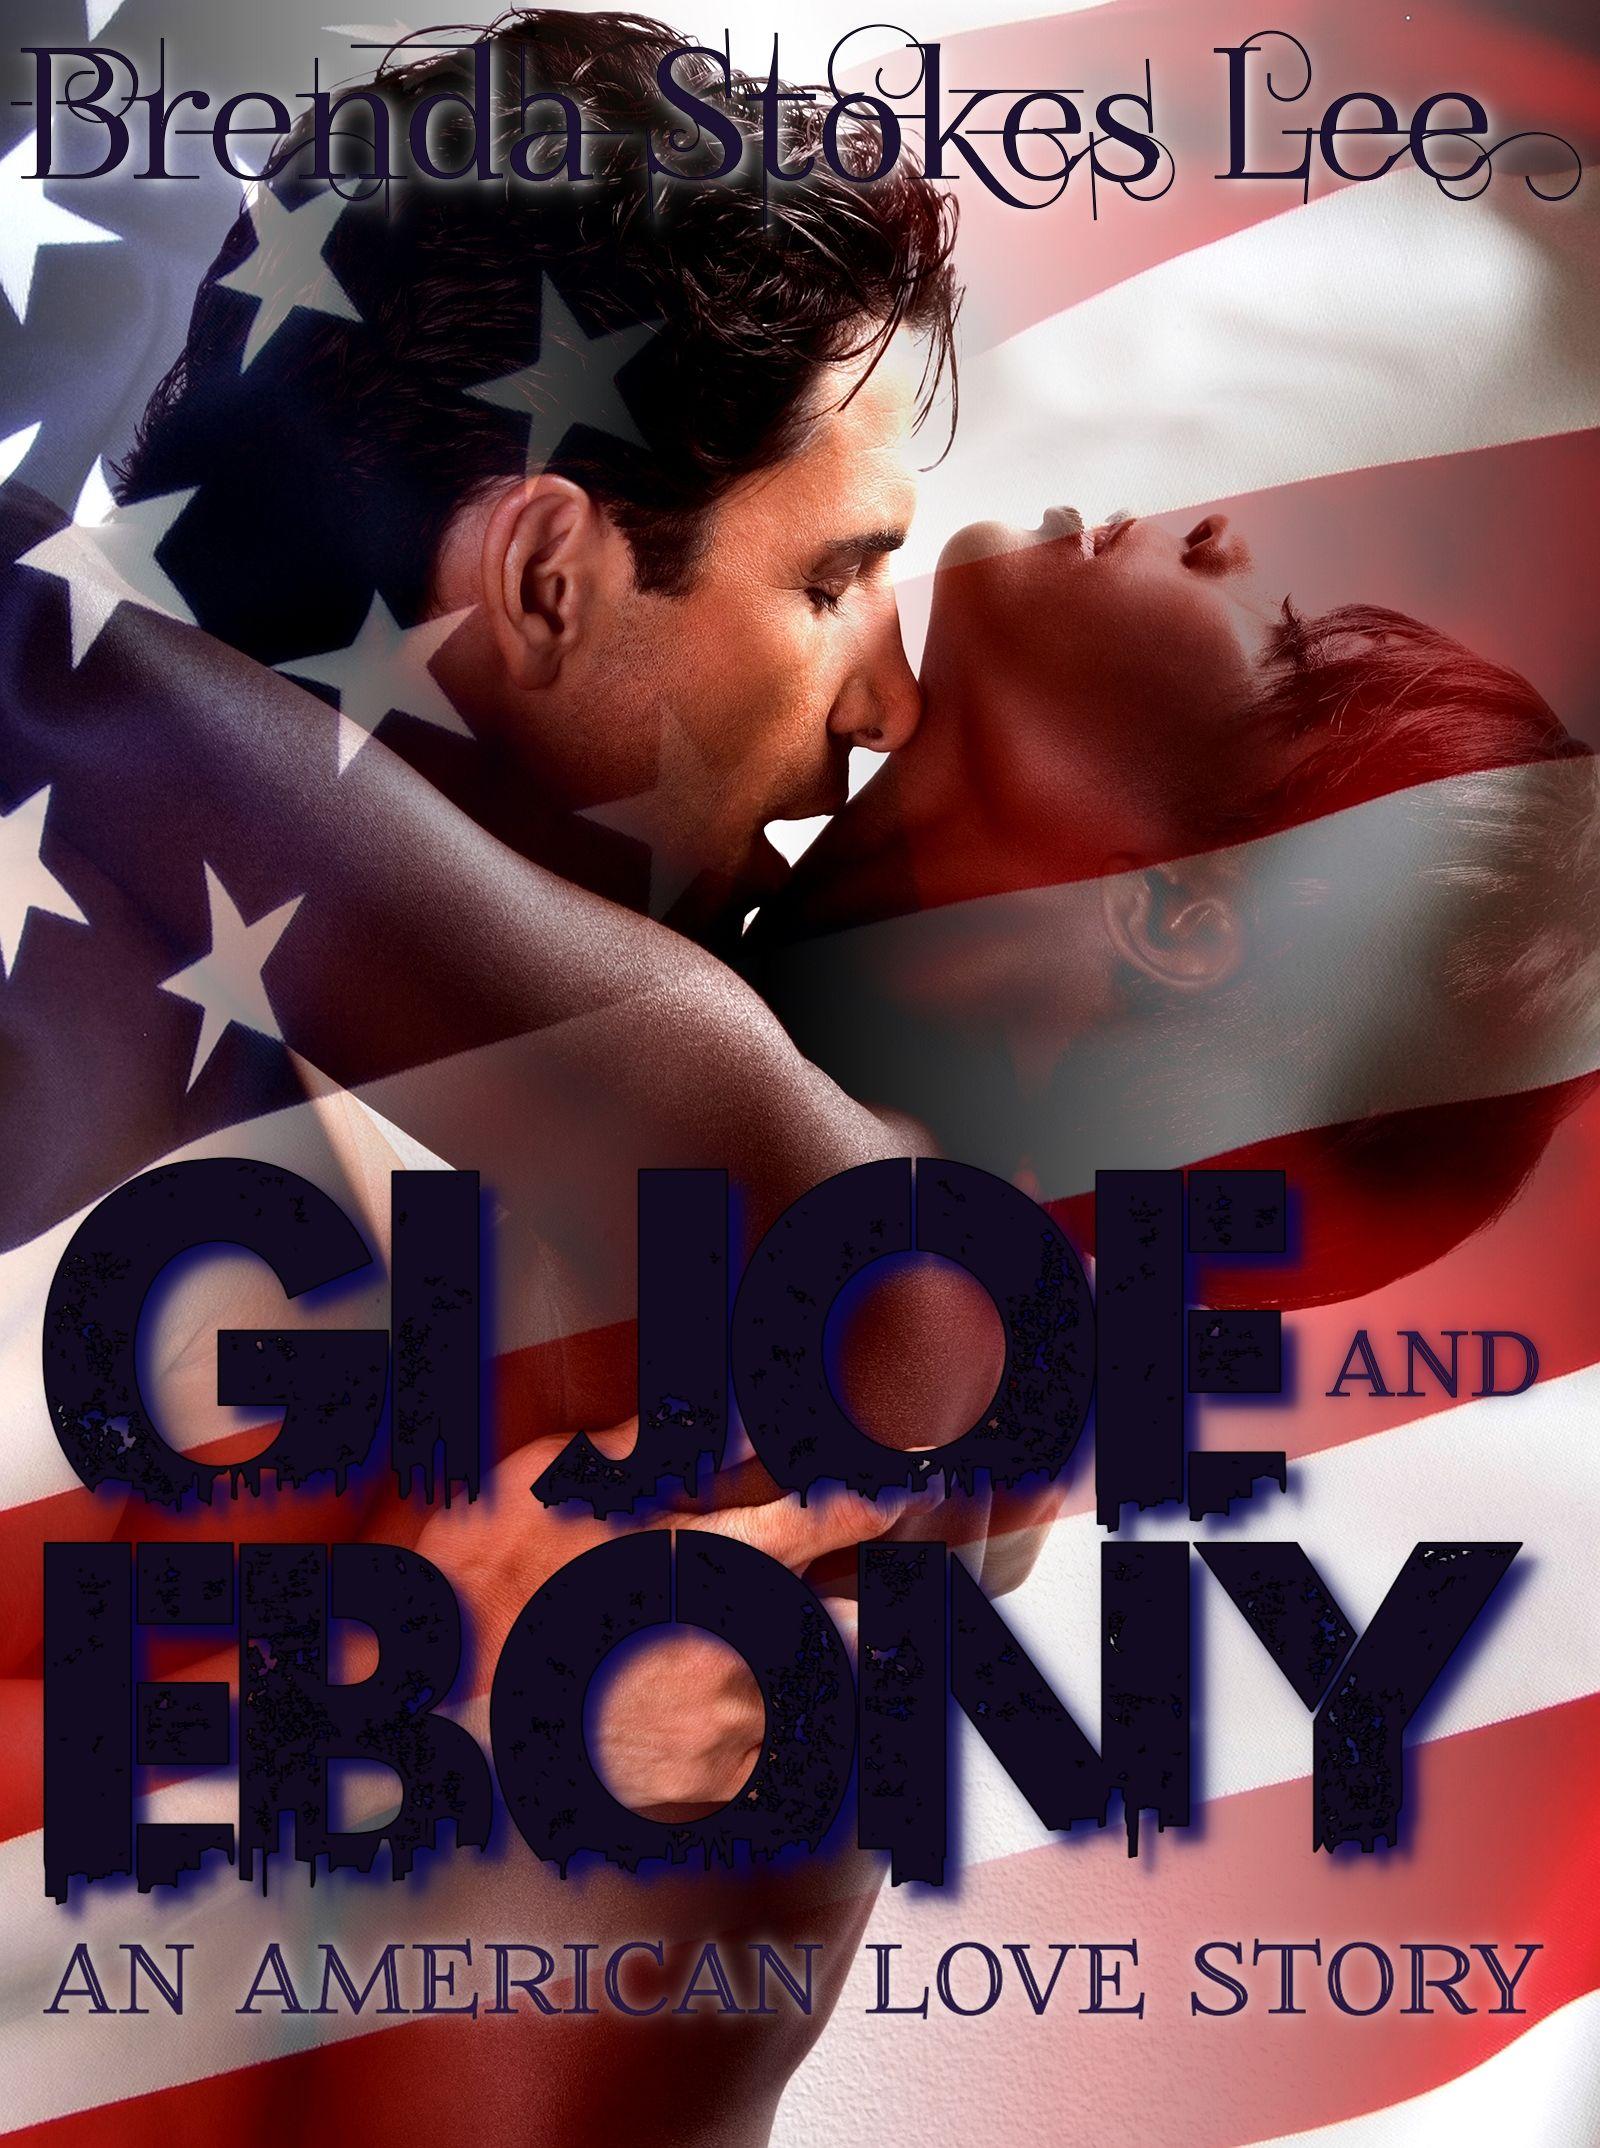 American erotic stories can